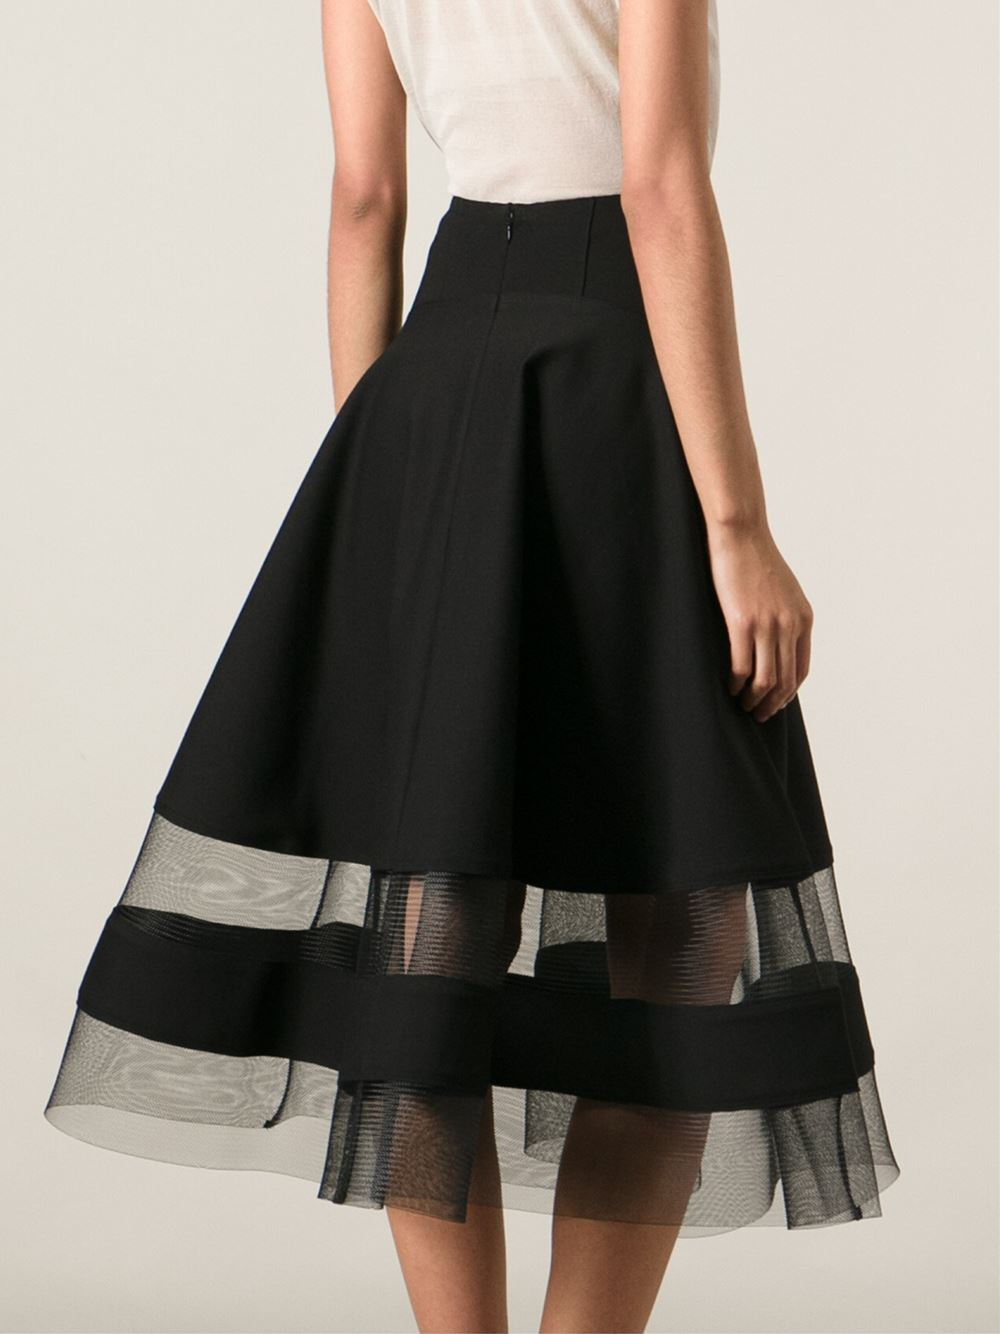 Armani Sheer Striped Hem Skirt In Black Lyst